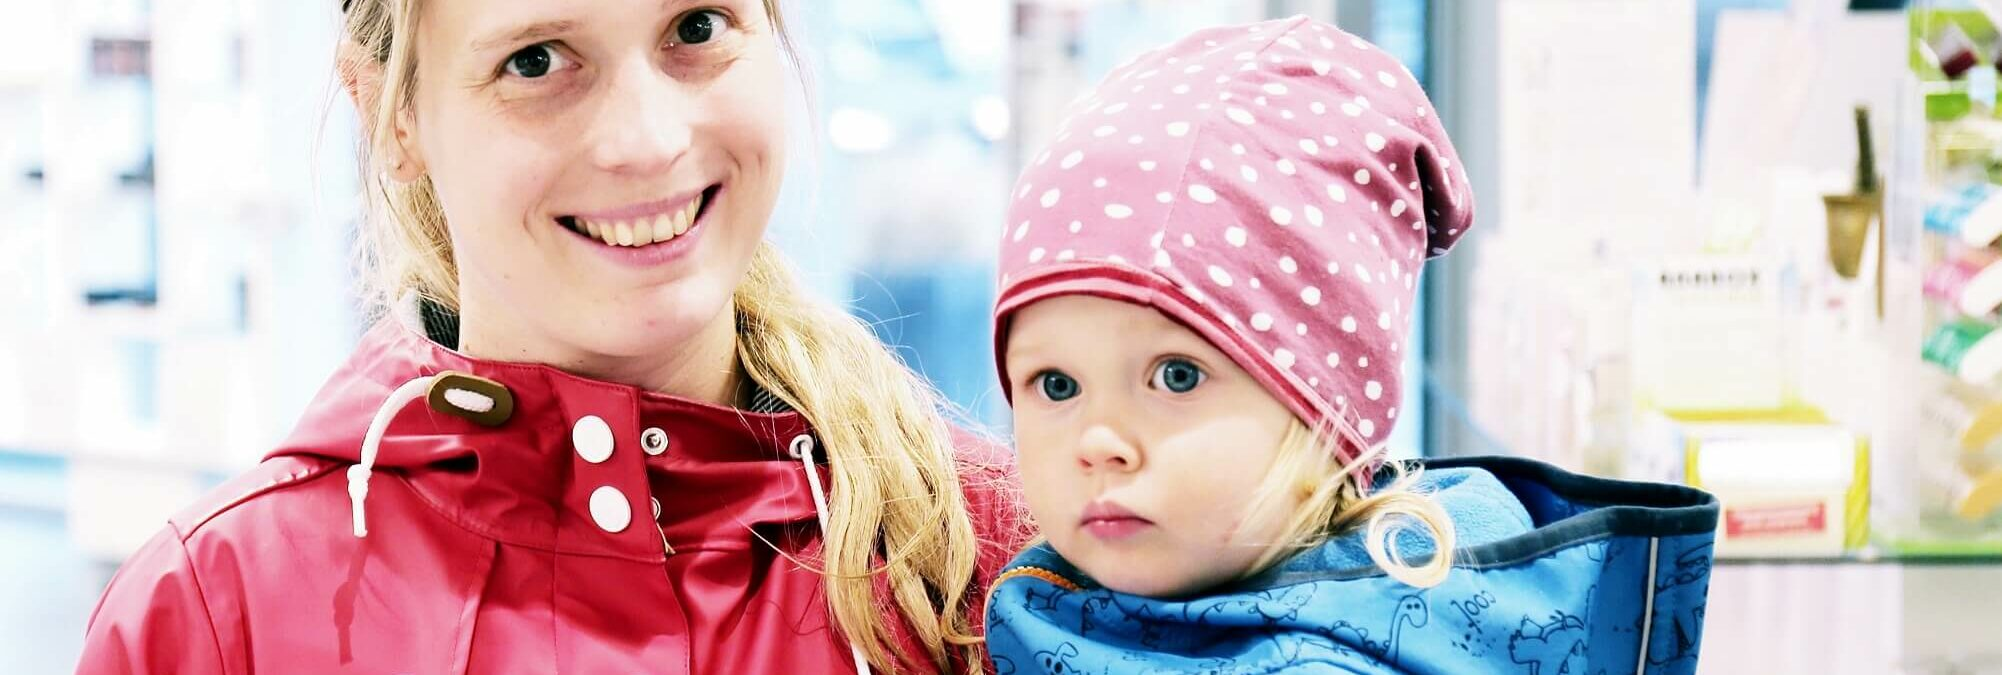 rosen-apotheke-guetersloh-familie-kindundmutter